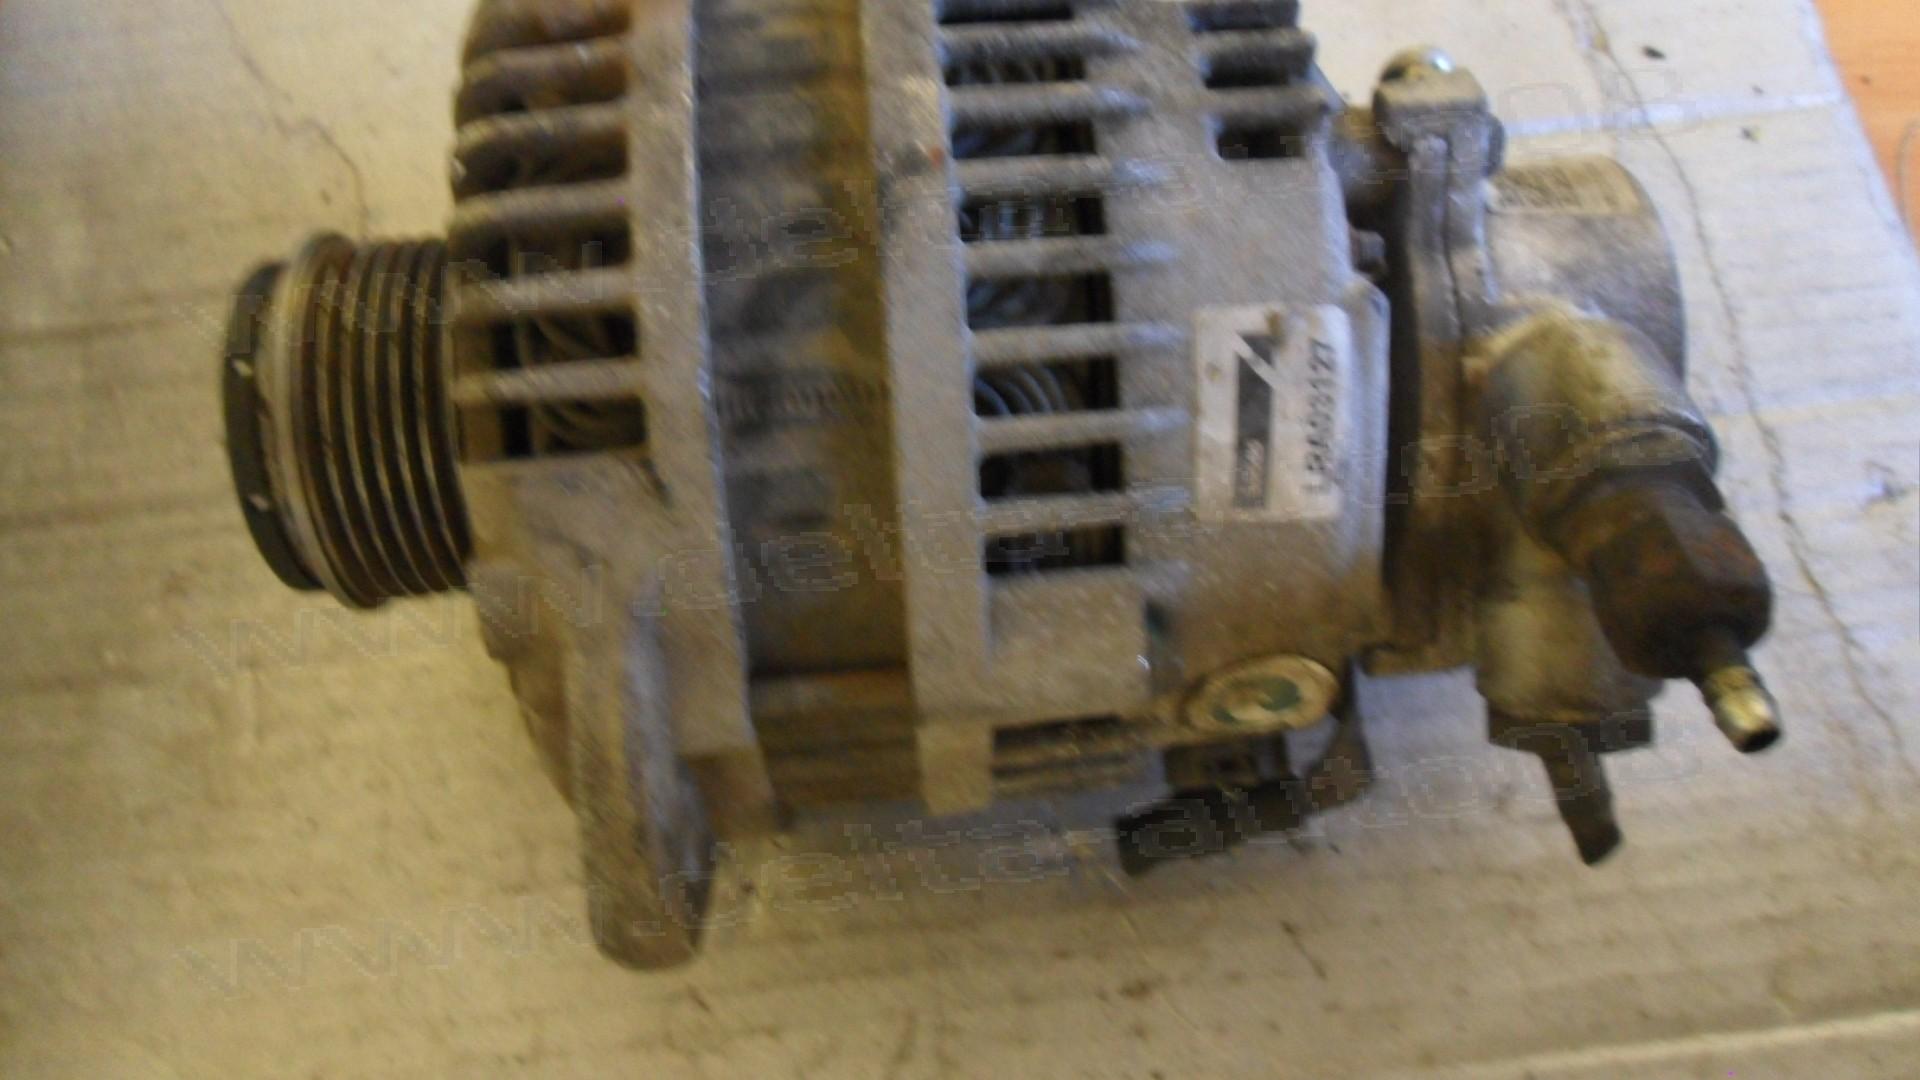 Алтернатор, генератор за Opel Corsa, Astra H, 1.7 CDTI, 2004-2014г., LR1110-502-M1, LR1110502M1, LRA03127